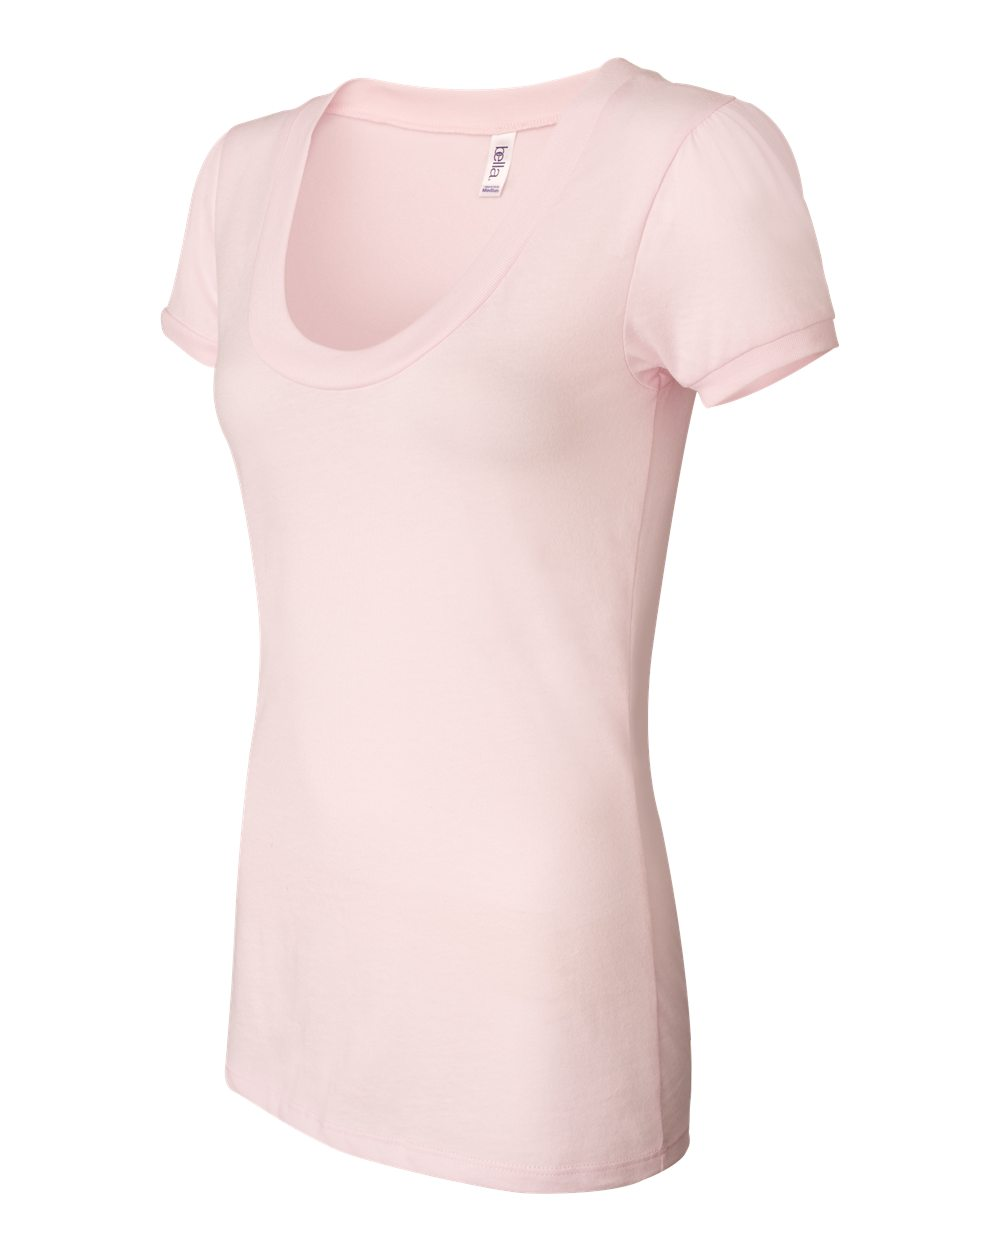 Bella 8406 Soft Pink